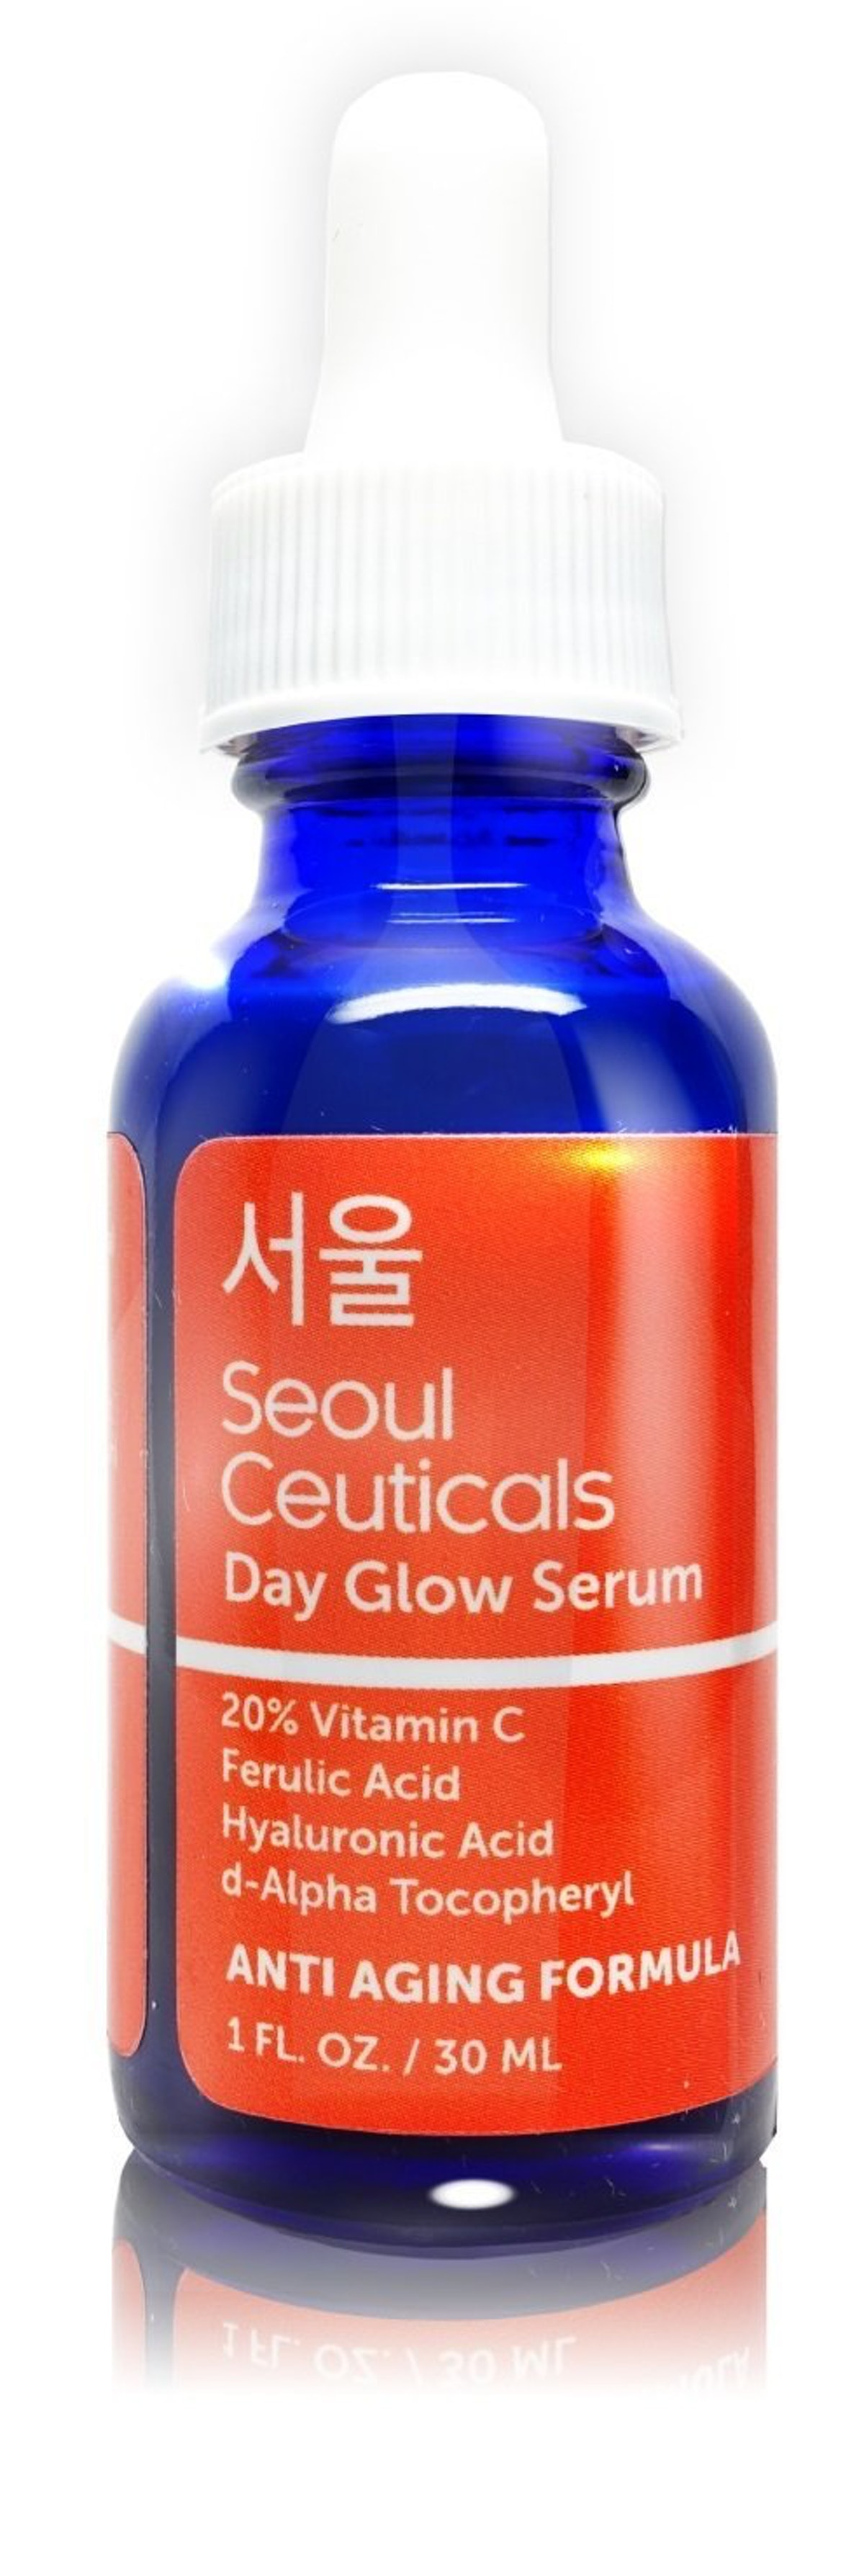 Seoul Ceuticals Day Glow Serum